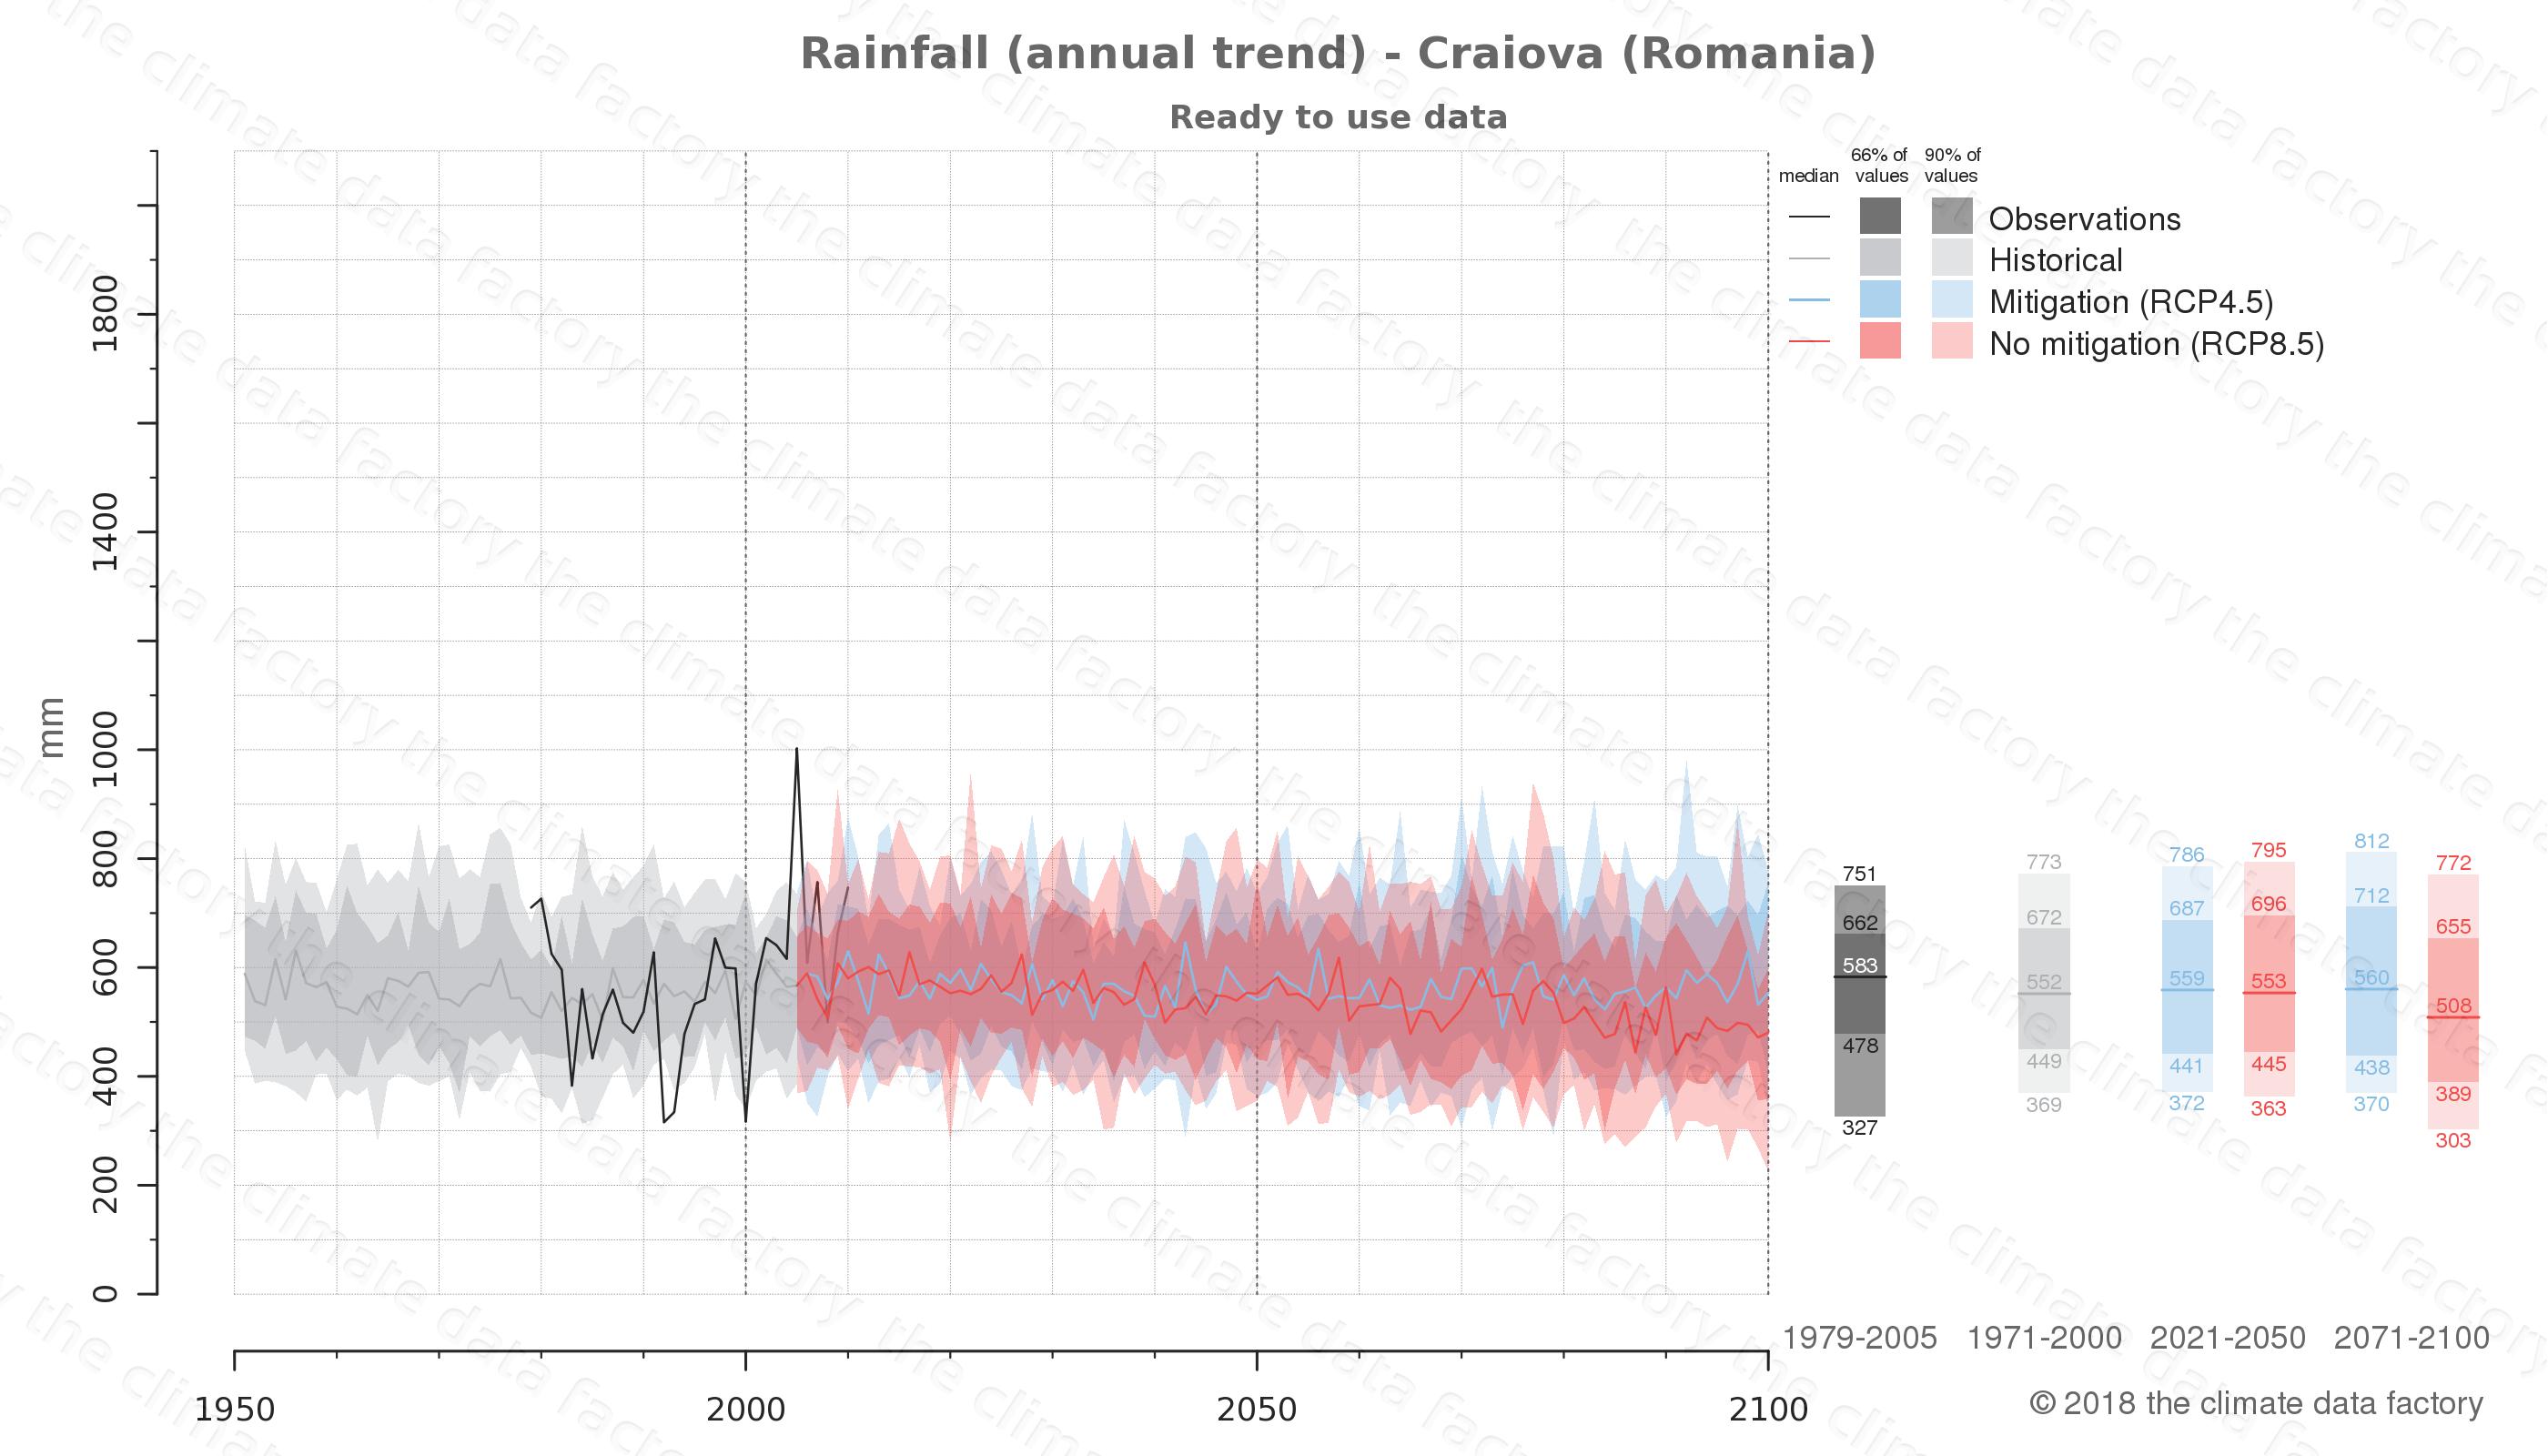 climate change data policy adaptation climate graph city data rainfall craiova romania